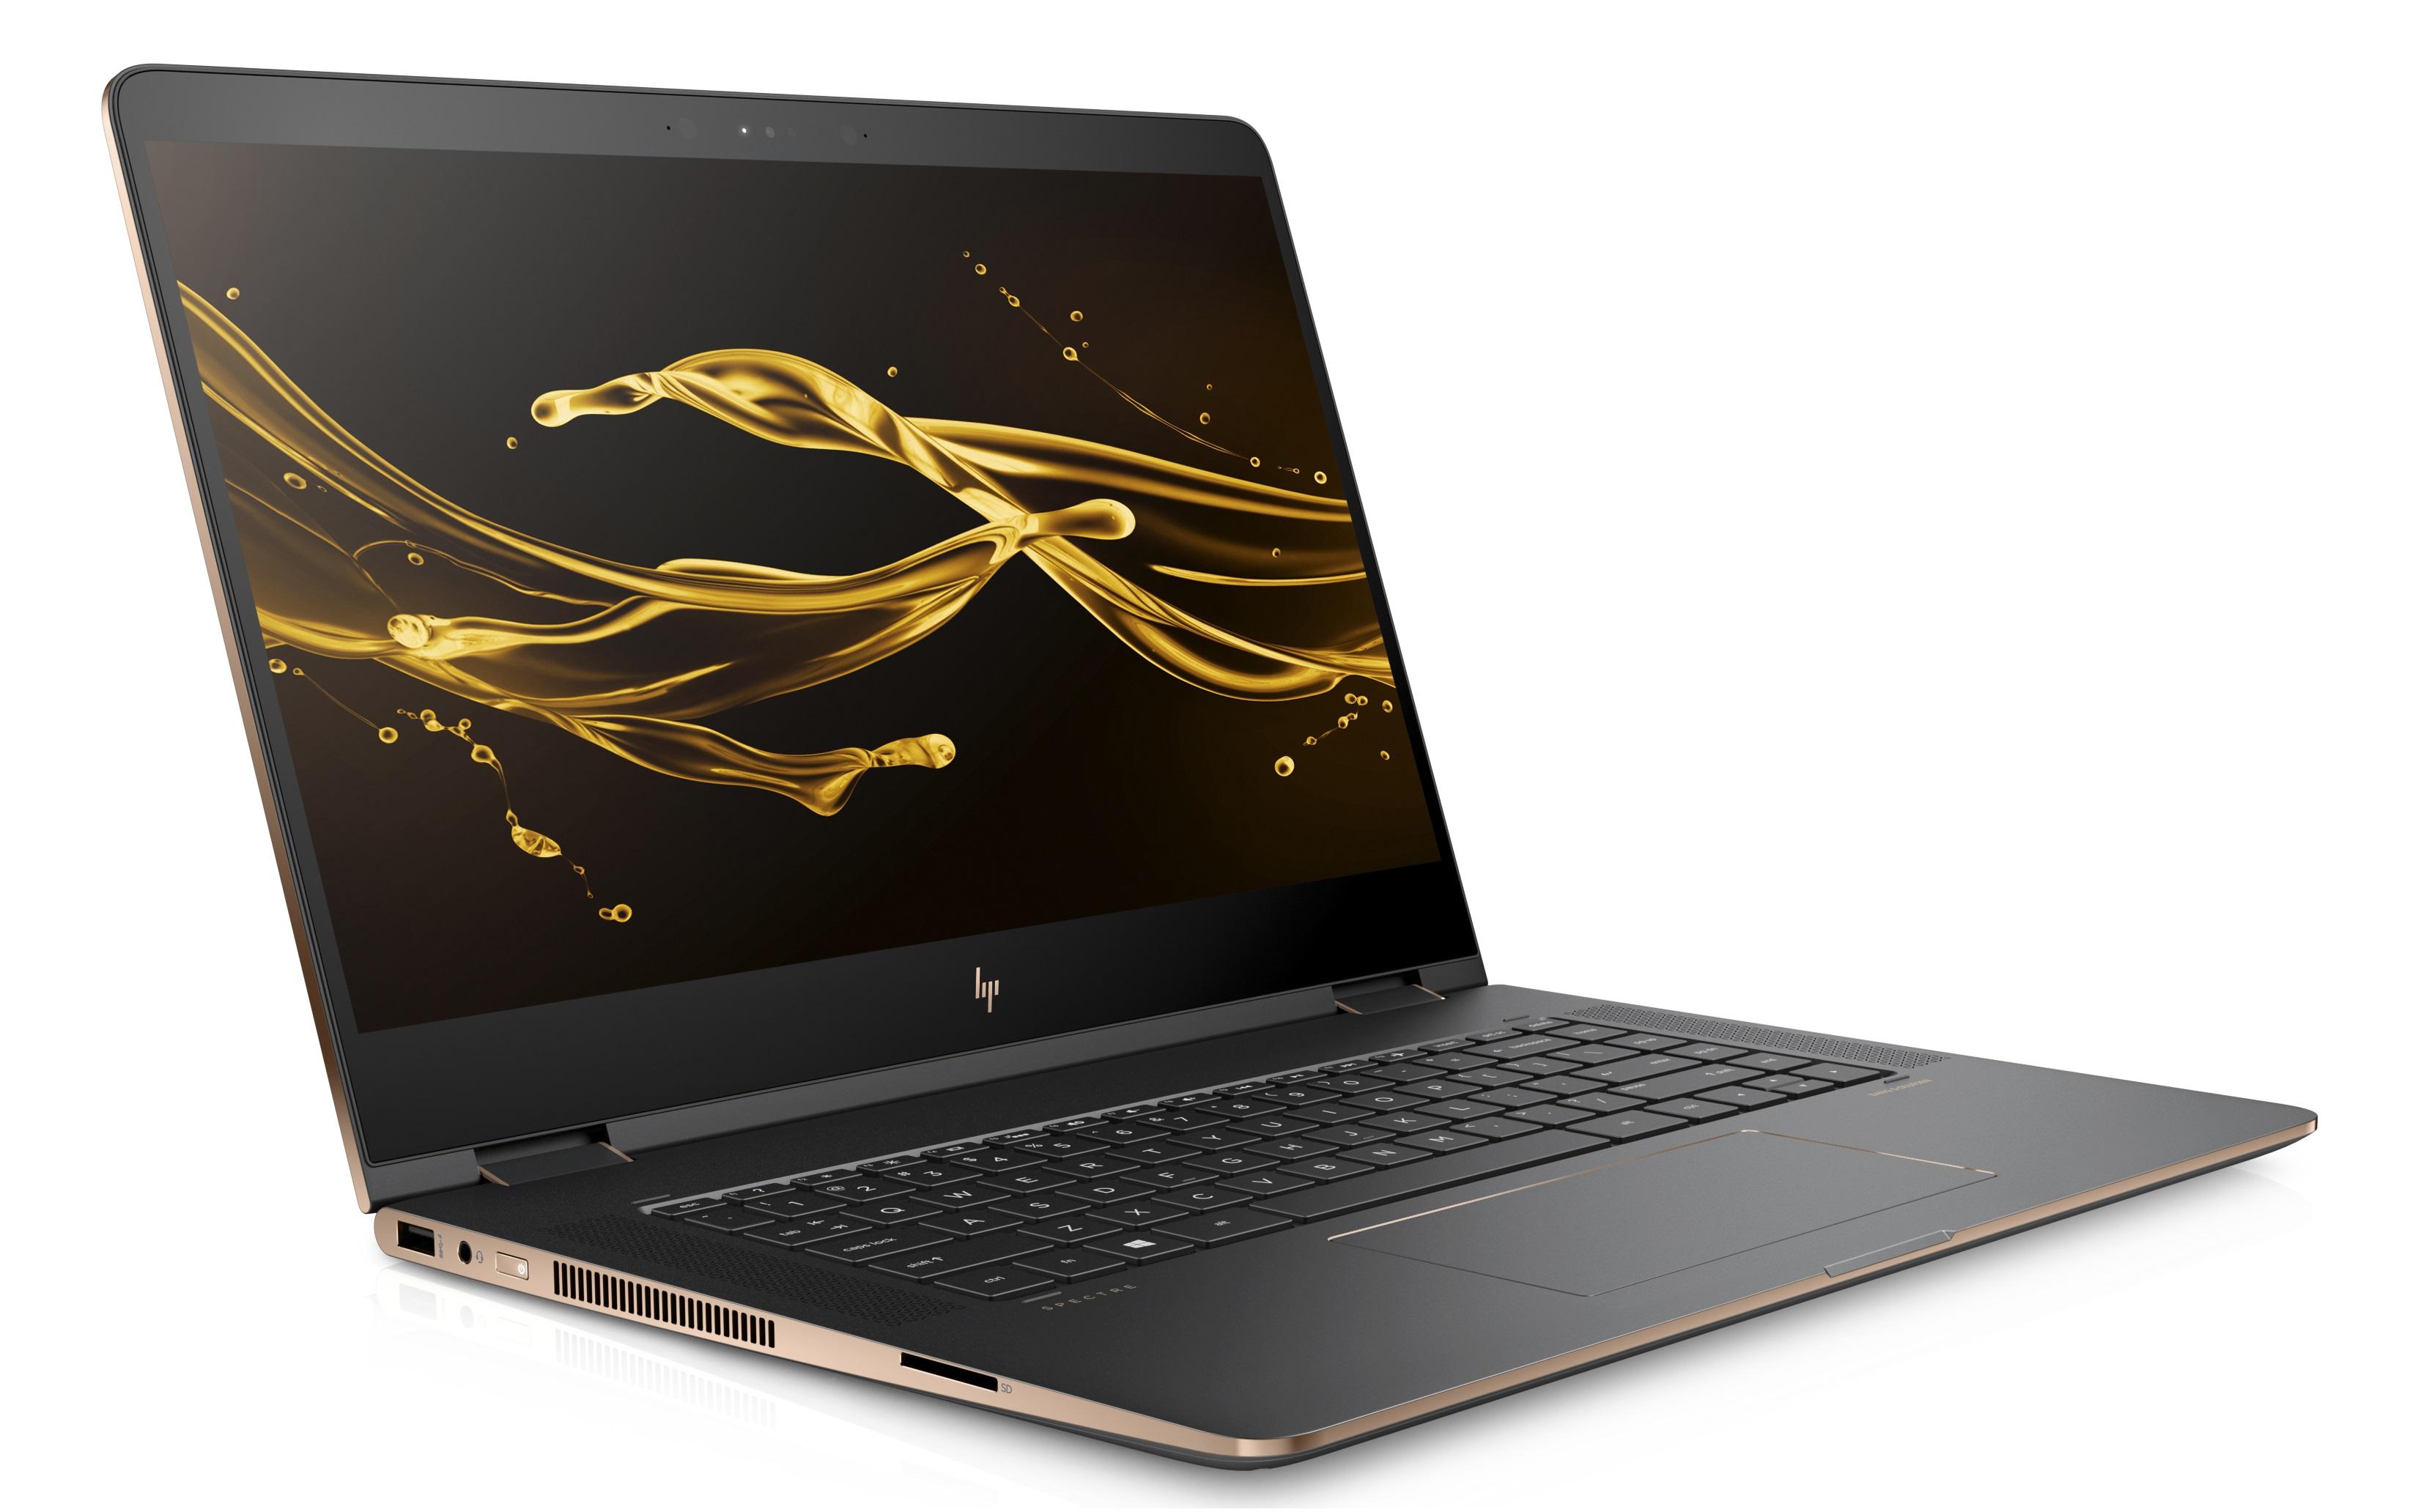 HP Spectre x360 15 6 2017